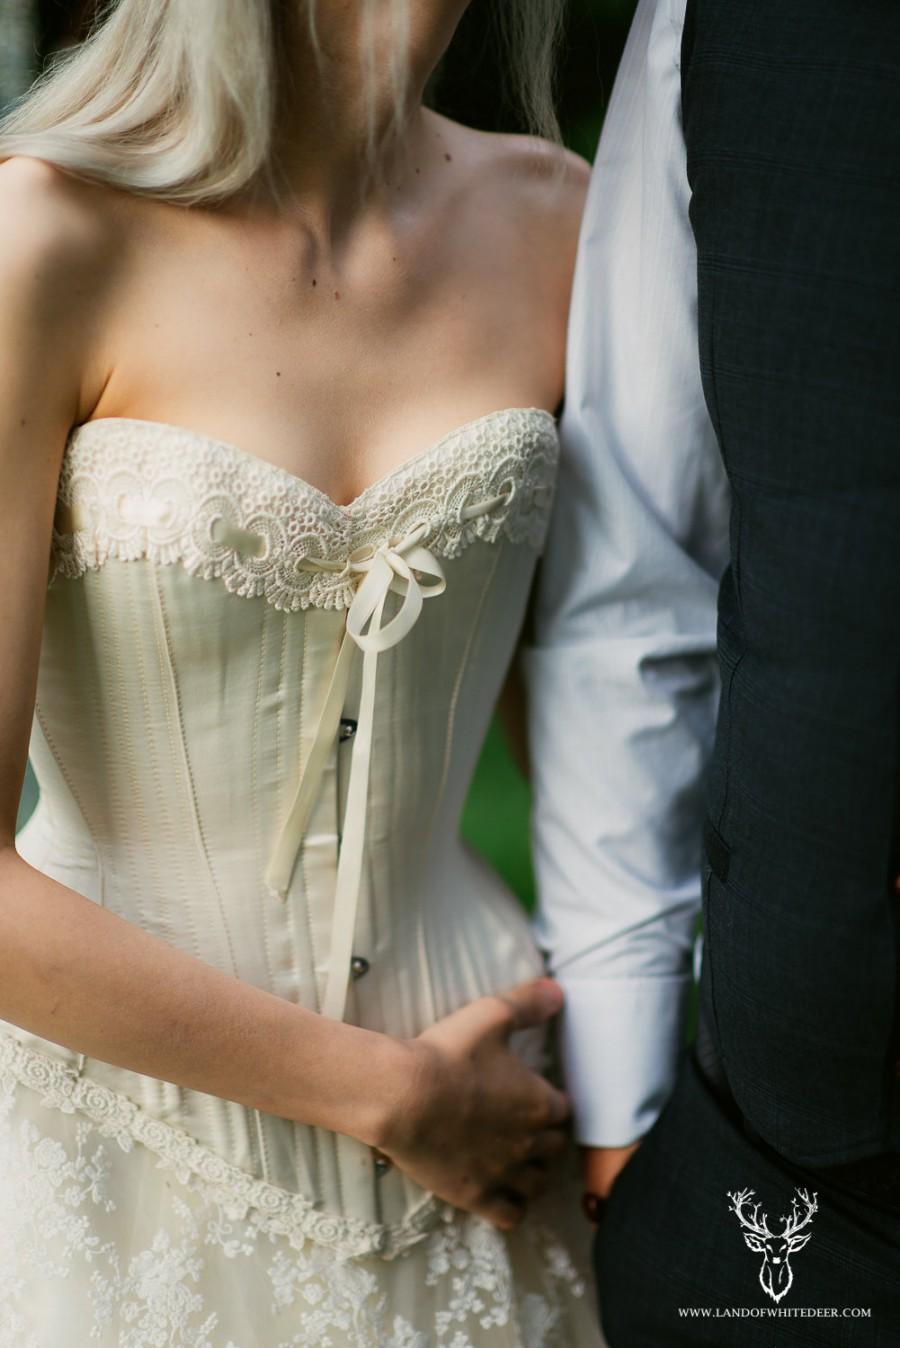 Wedding - Handmade Cream Satin Wedding Corset